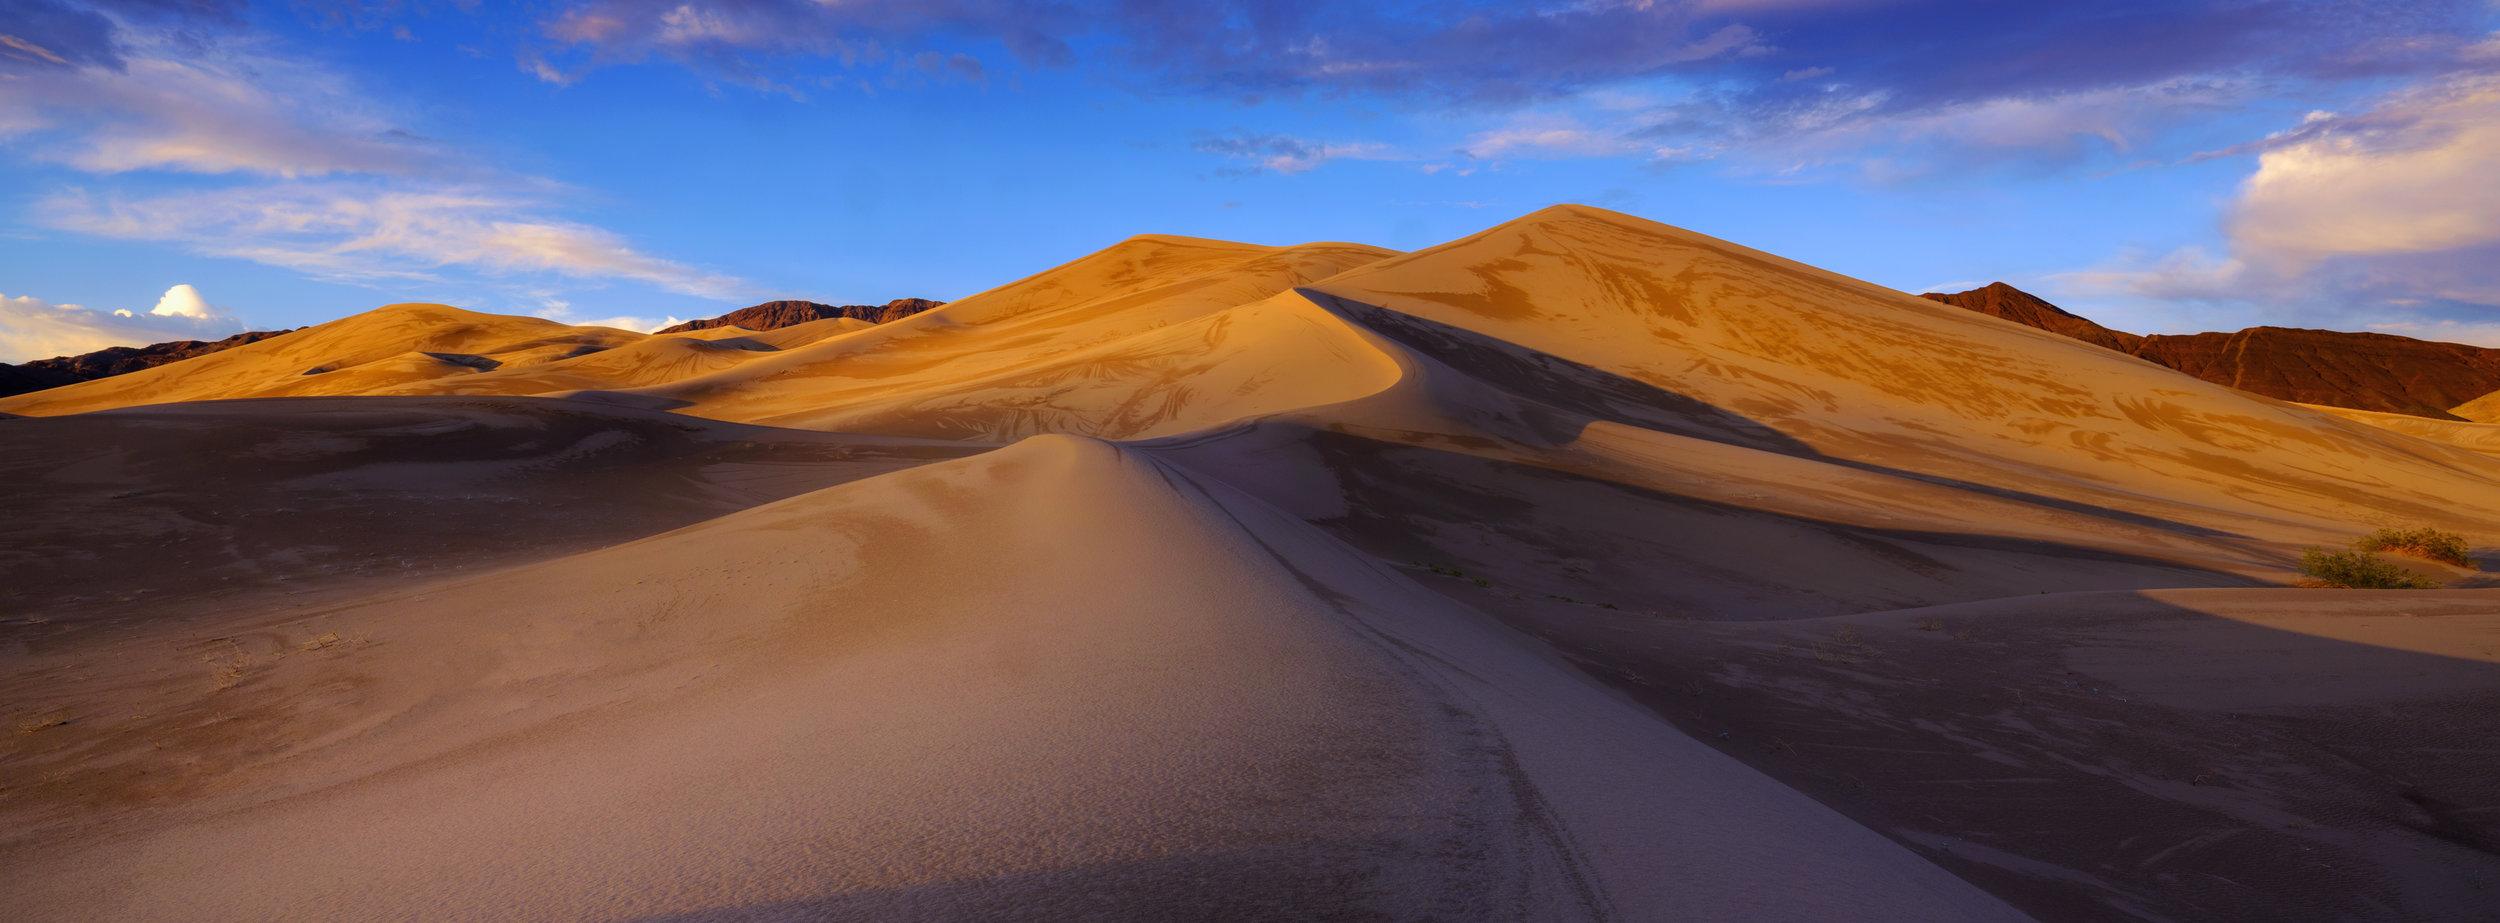 """Ibex Dunes"" Death Valley N.P., California"